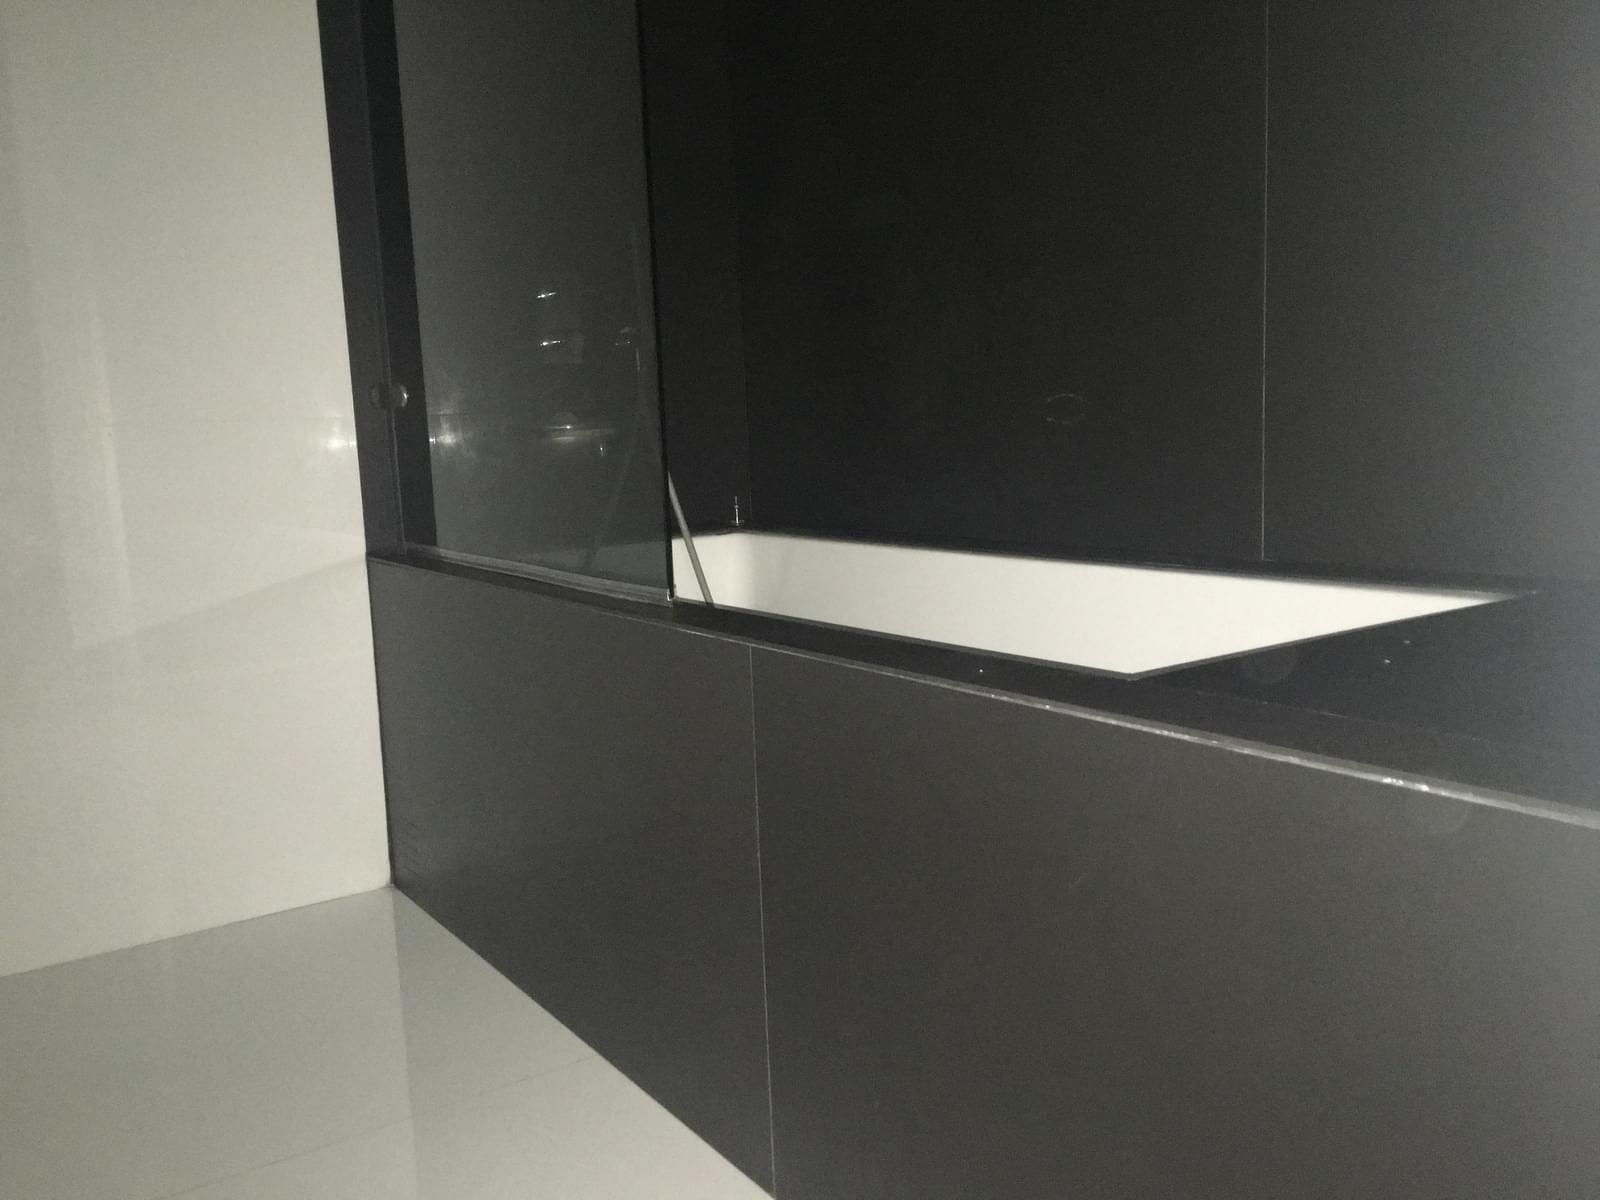 pf17018-apartamento-t2-lisboa-6b2f9afe-aa74-4d9d-875d-e4c35790f22f